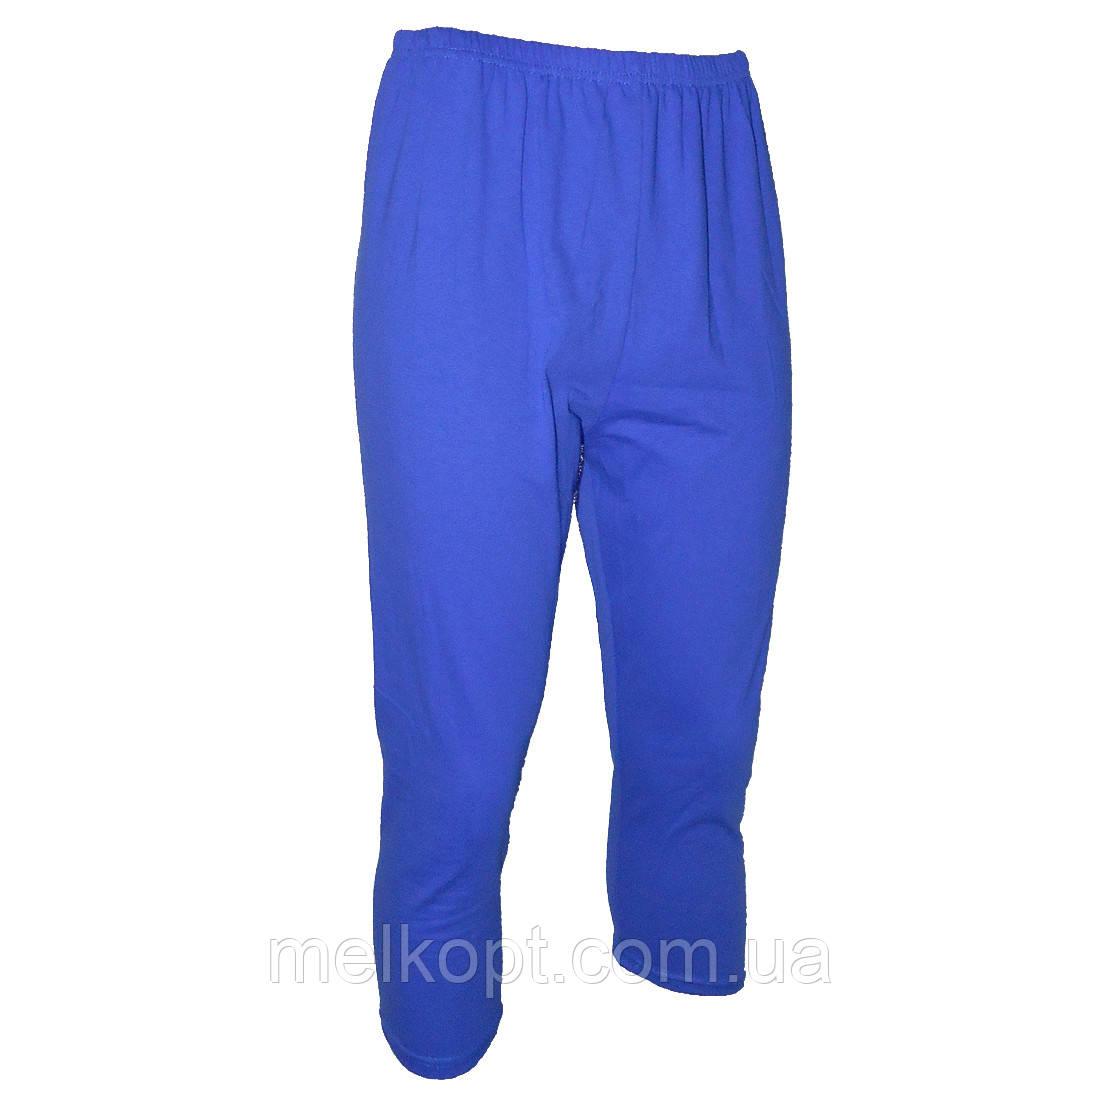 Бриджи женские Marafet от 79 грн./шт. (синие)